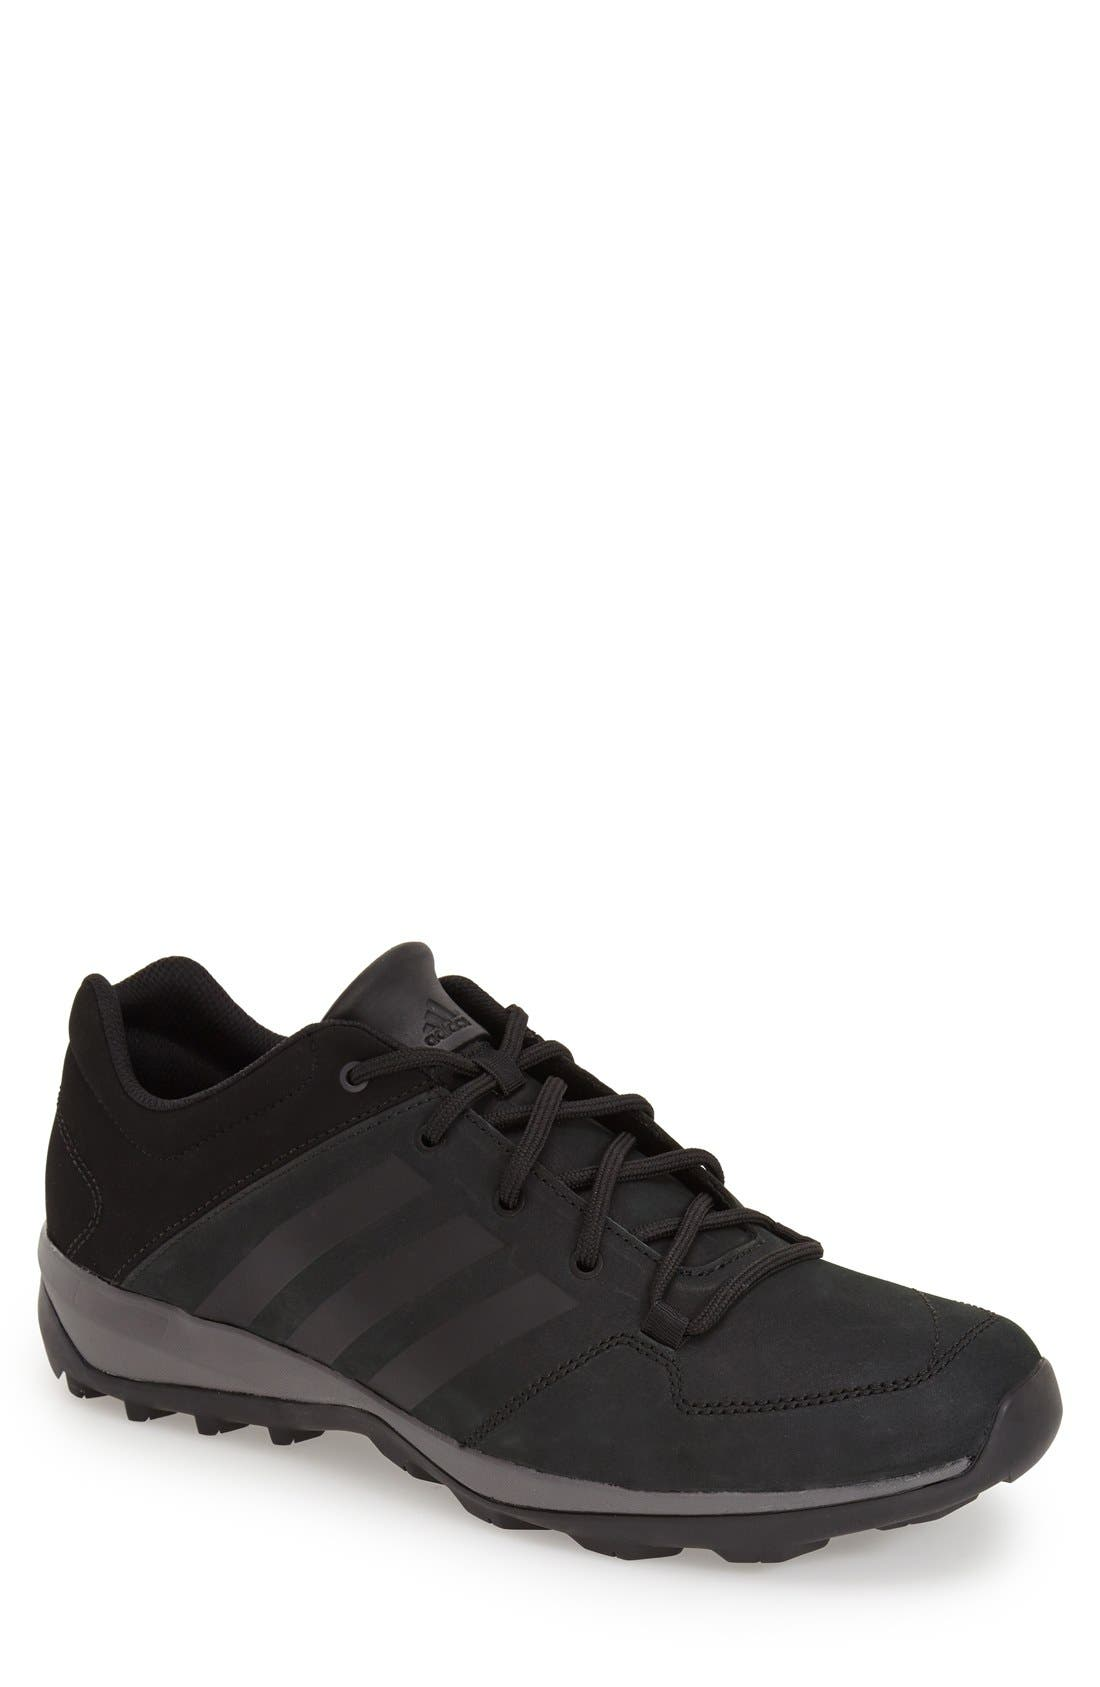 ADIDAS 'Daroga' Hiking Sneaker, Main, color, 001